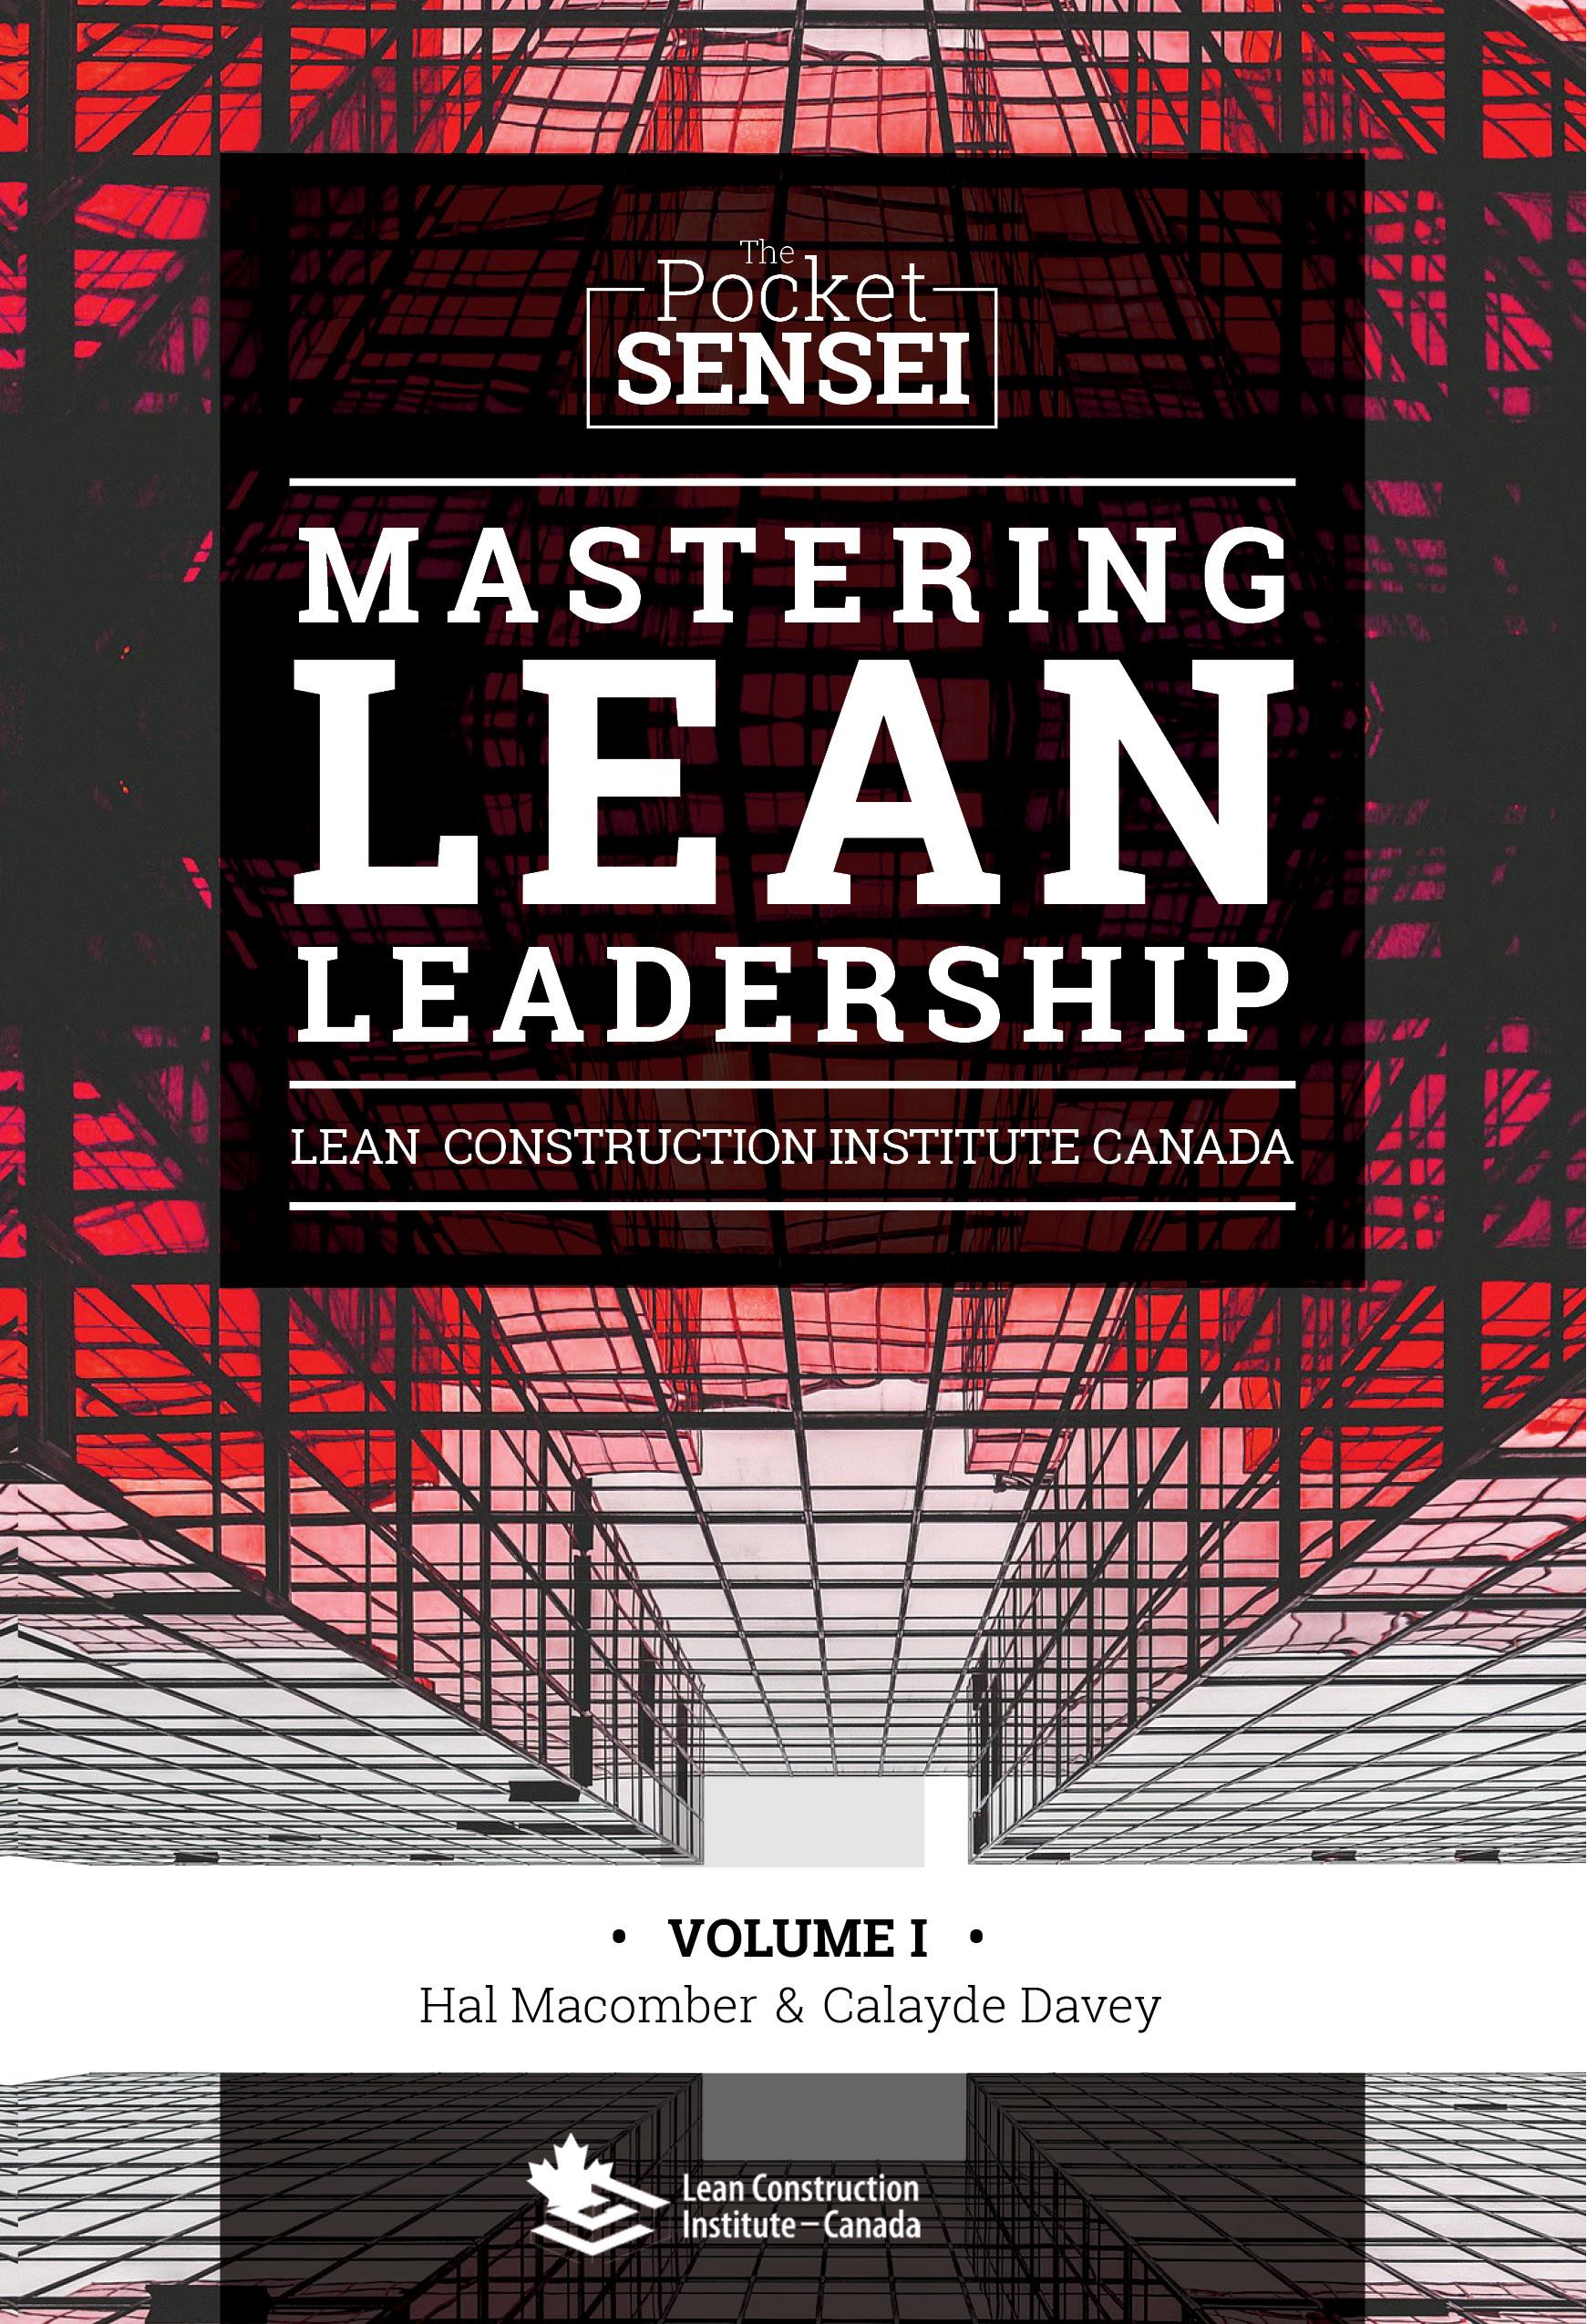 Special Edition - Lean Construction Institute Canada